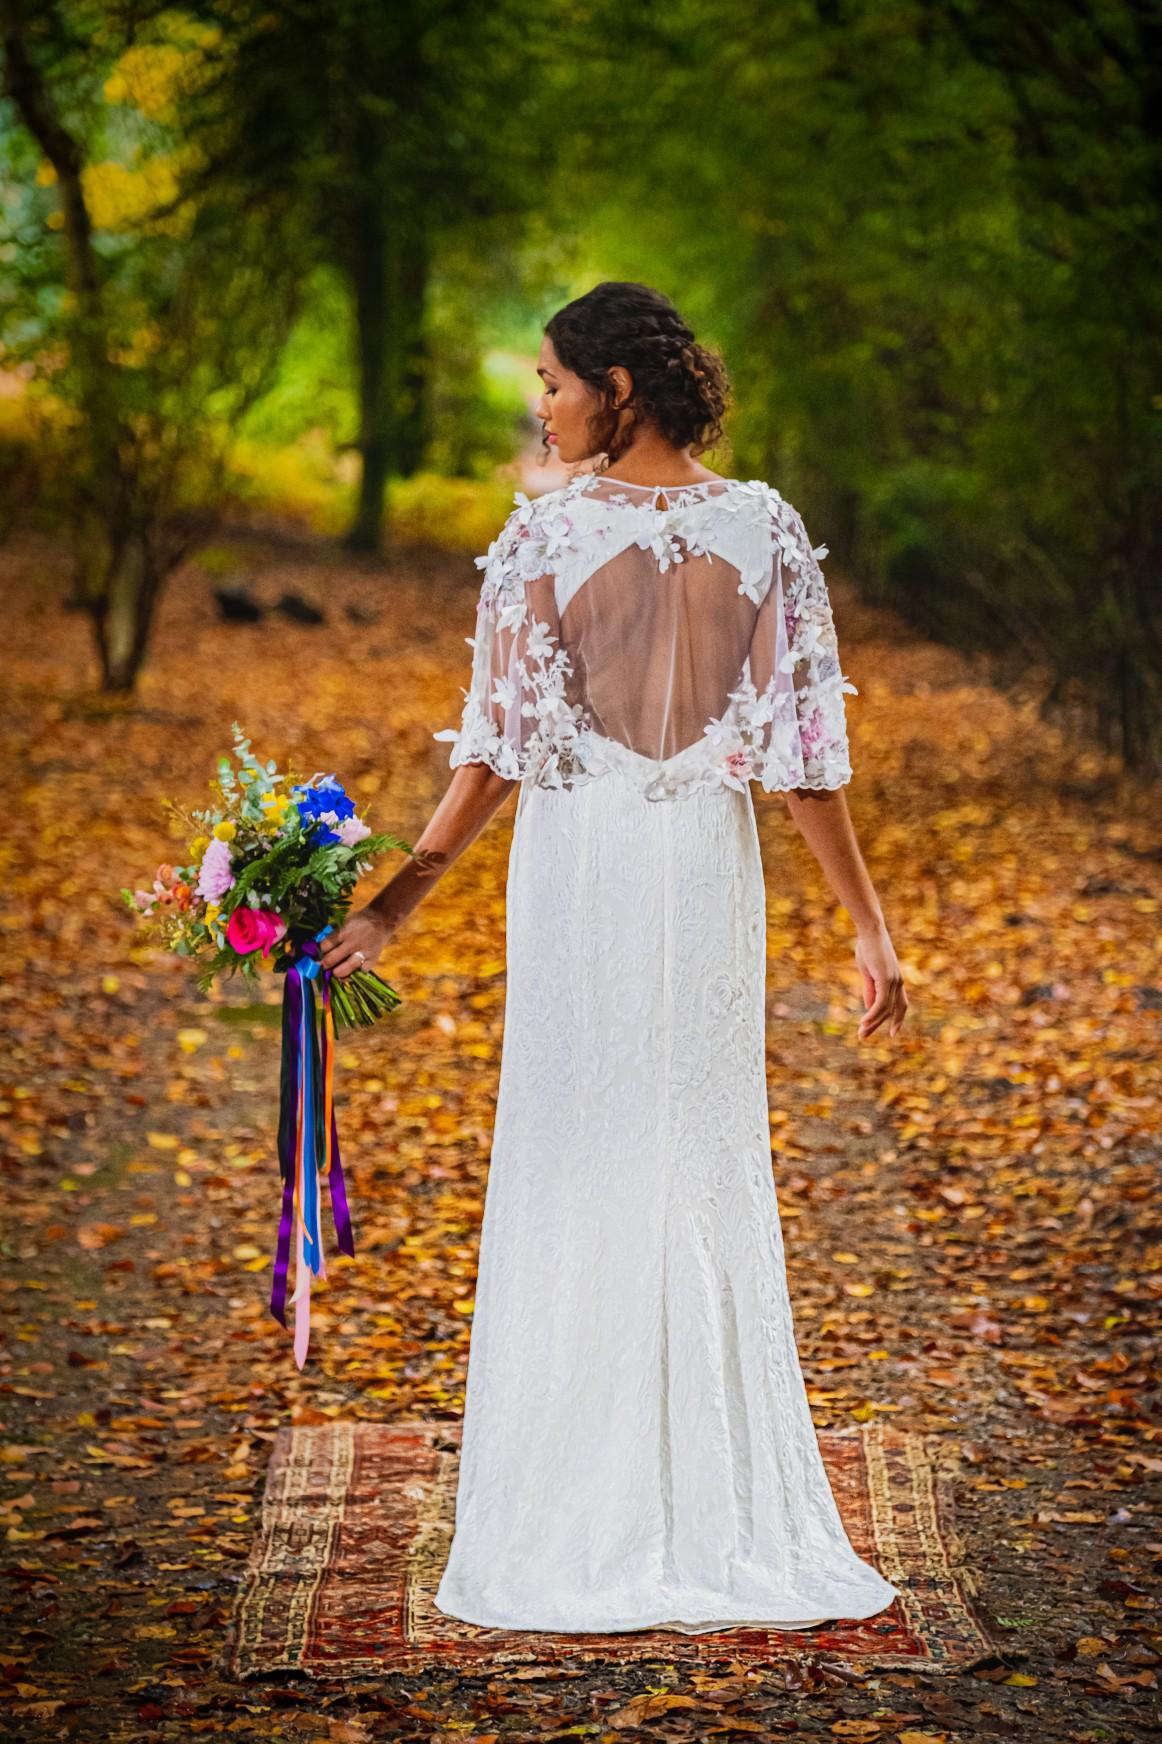 unique wedding dress - bespoke wedding dress - bohemian wedding dress - unconventional wedding - alternative wedding blog